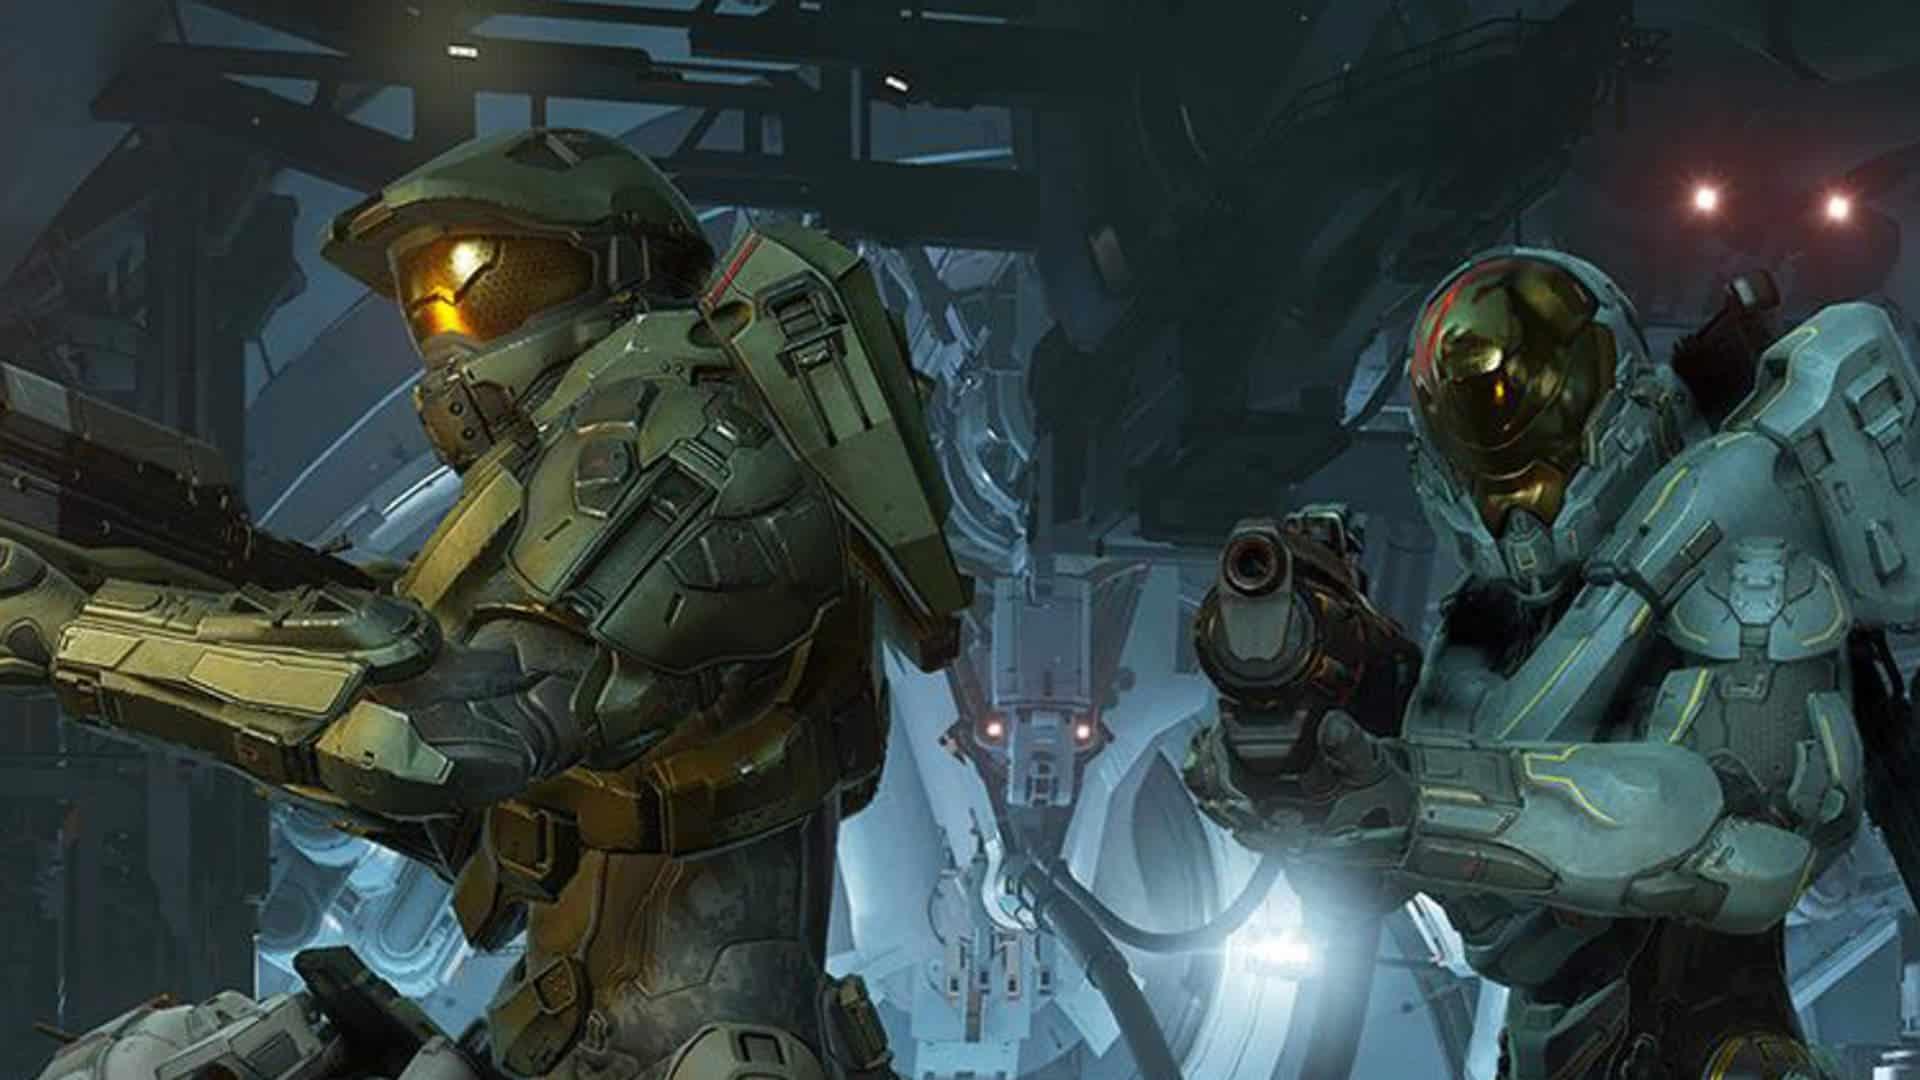 Halo 5: Guardians 343 Industries is a Halo formula failure